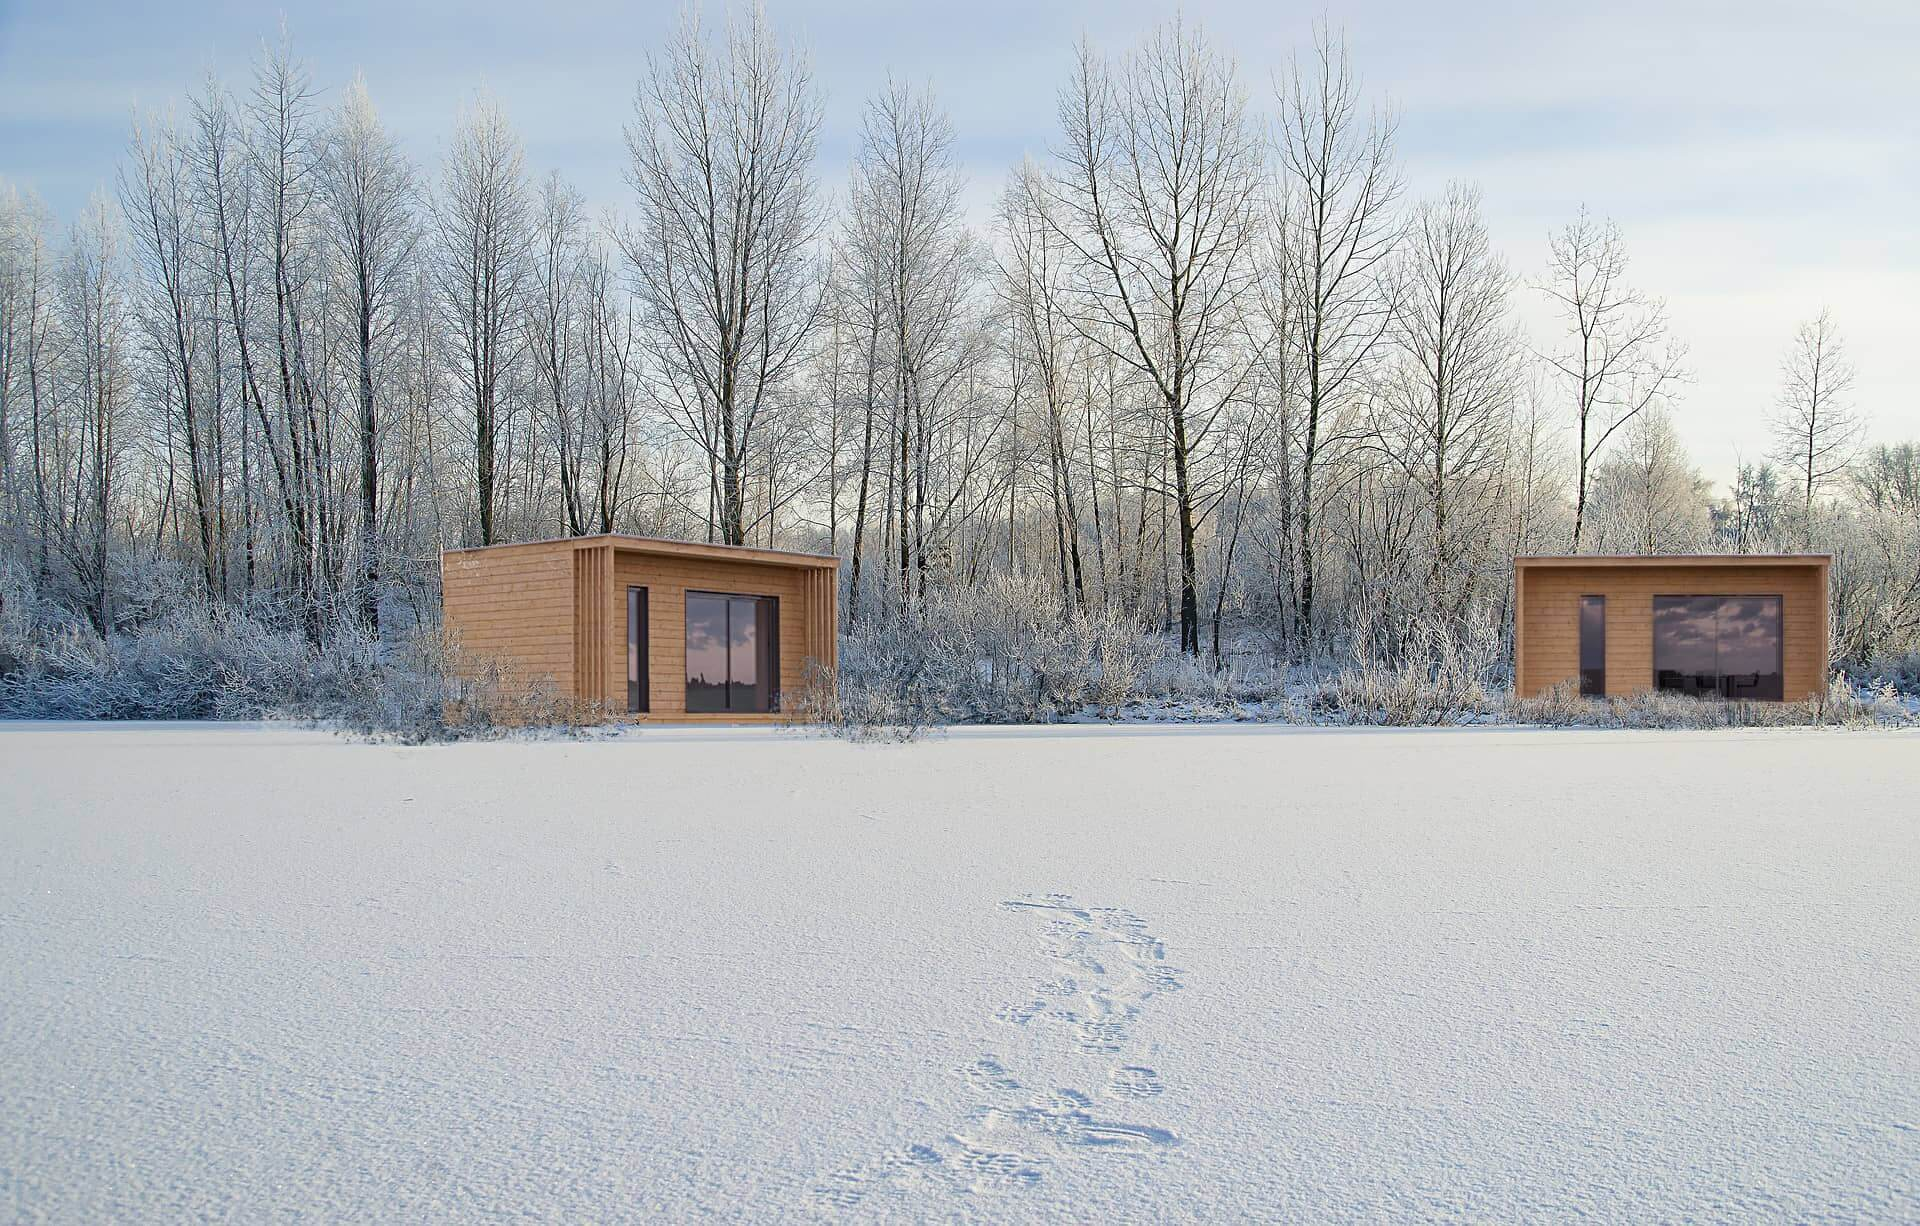 studio de jardin 20m2 hivers - Studio de jardin 20m2